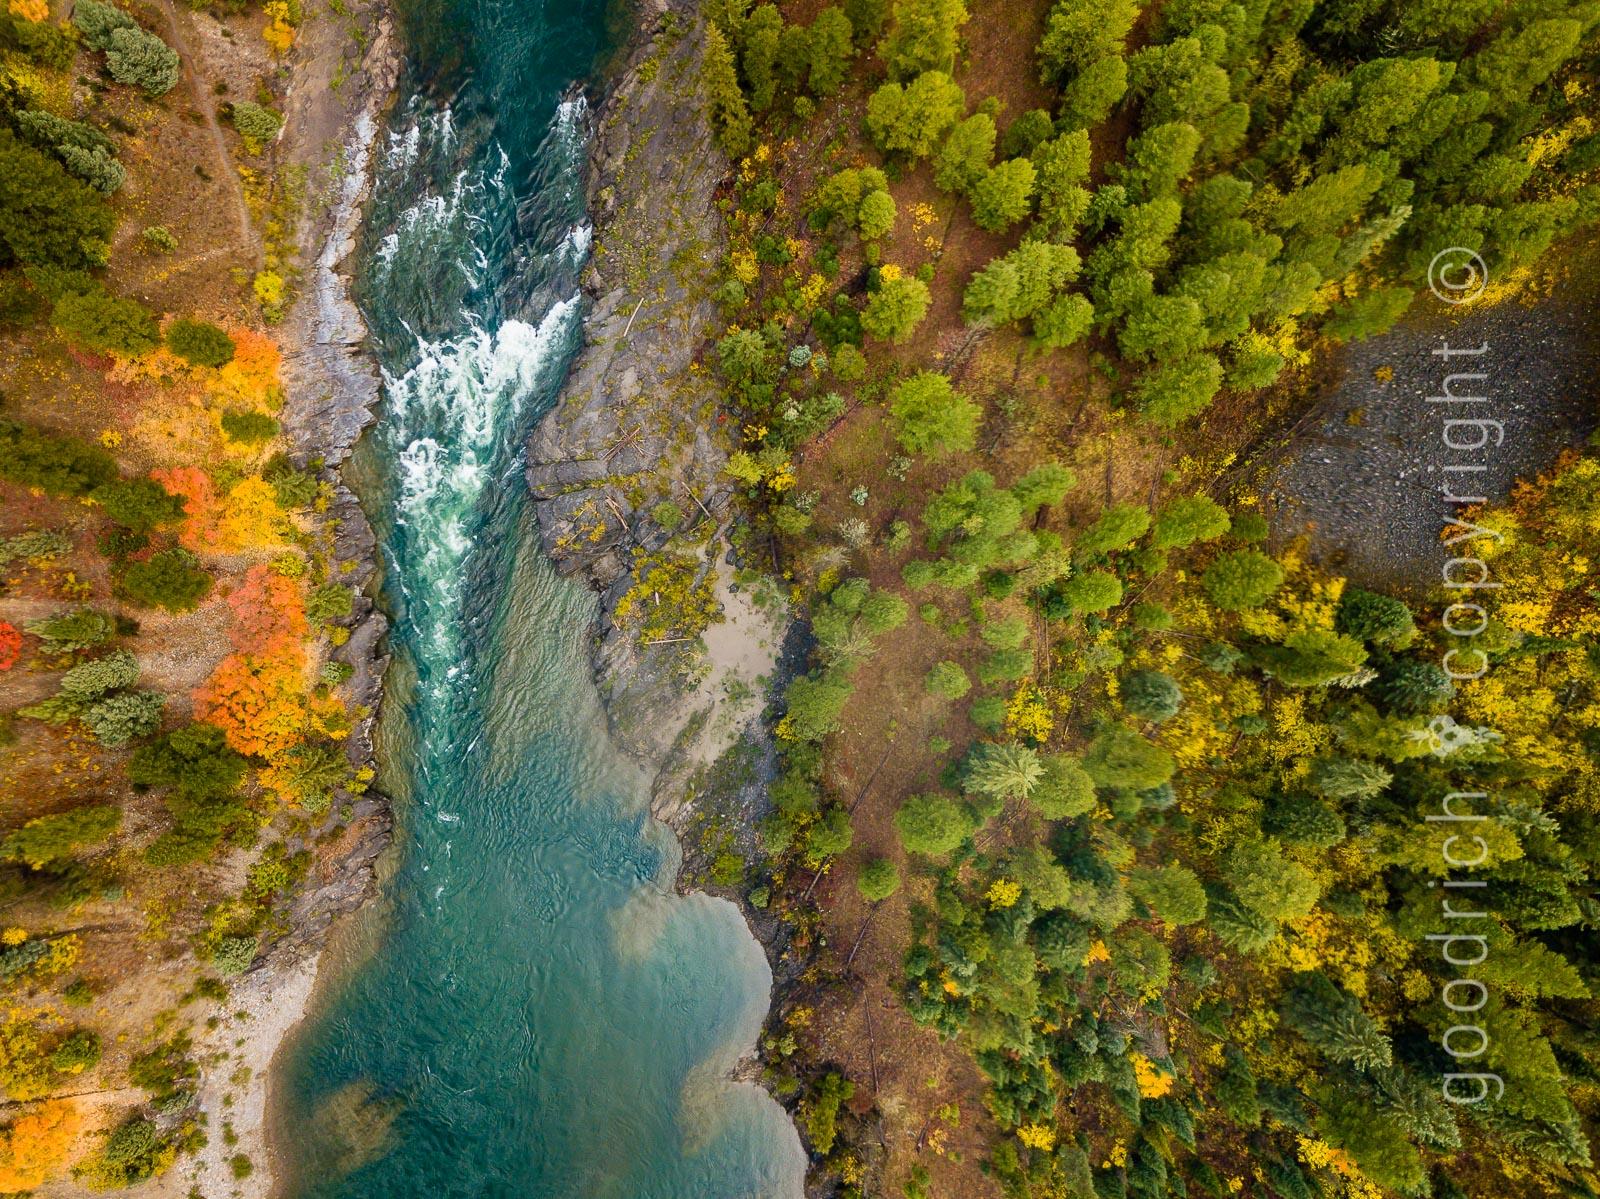 DJI Mavic Pro - Snake River - Photo by Jay Goodrich